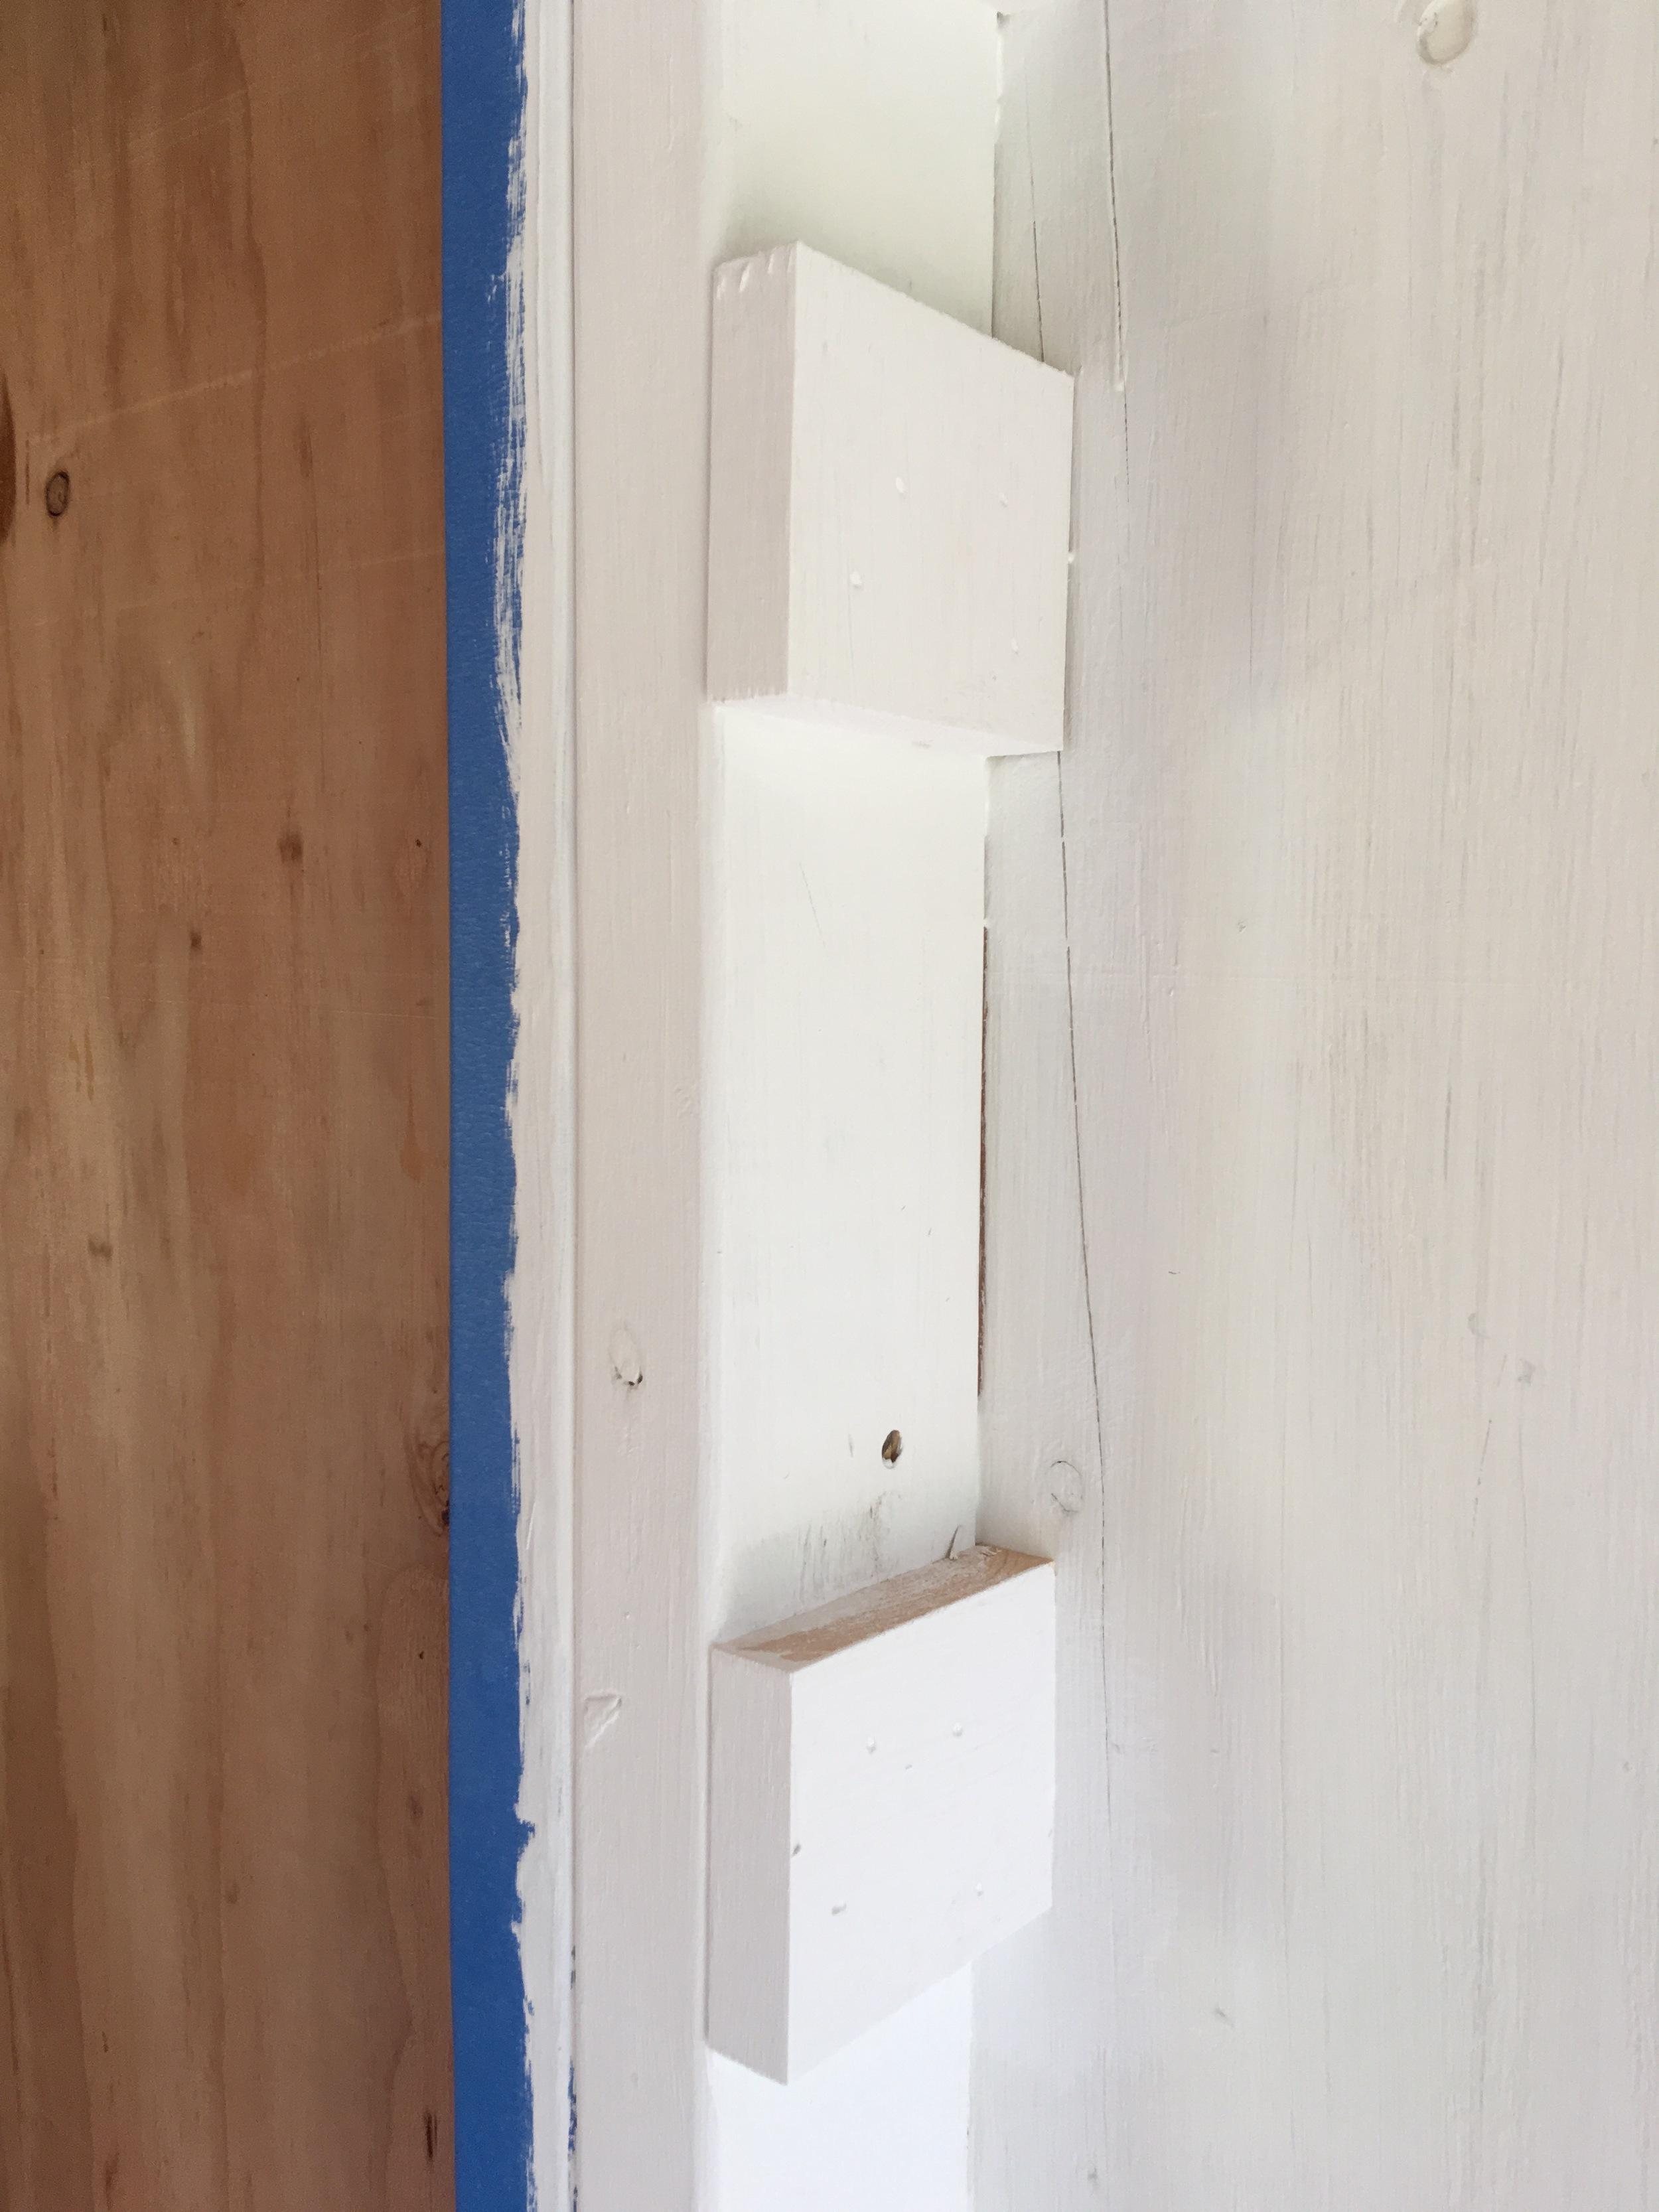 Shelf brace